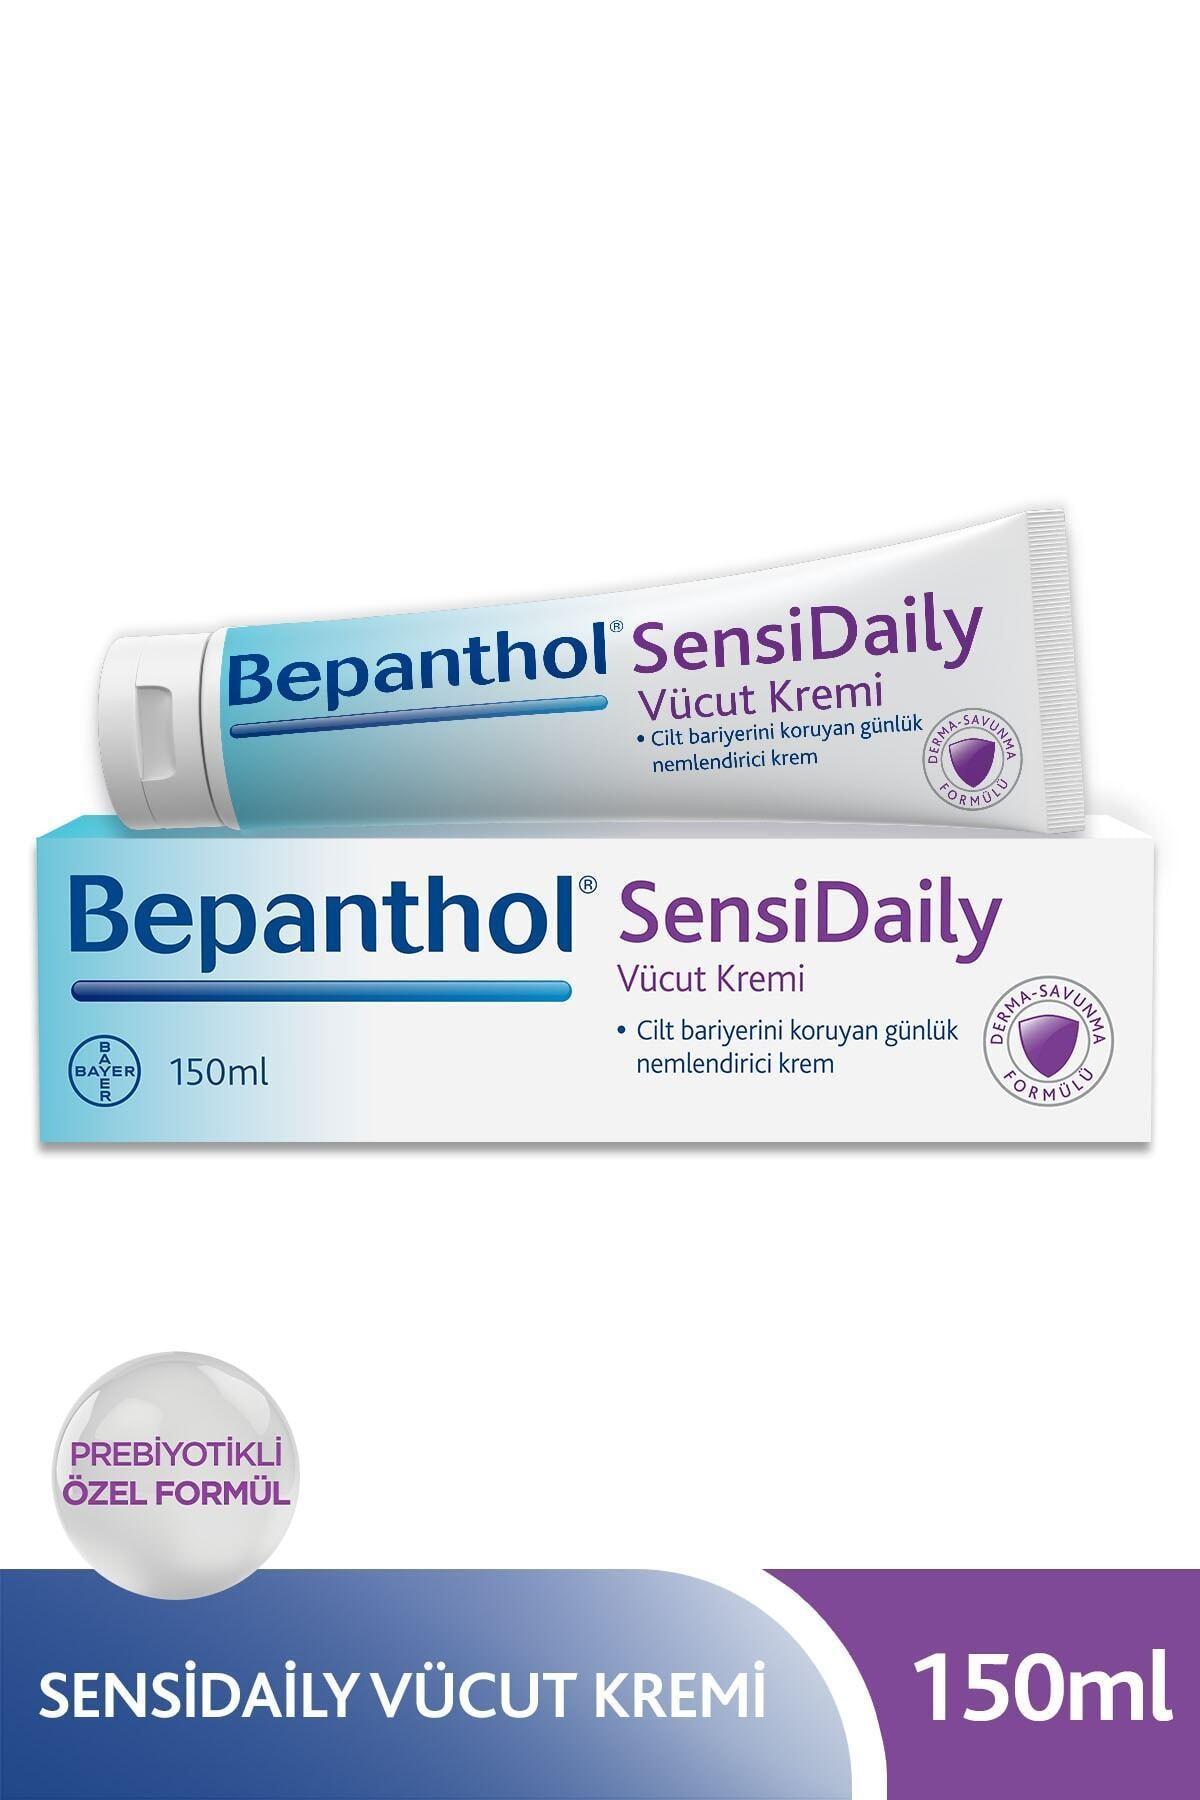 Bepanthol Sensidaily Vücut Kremi 150 Ml 8699546350247 2